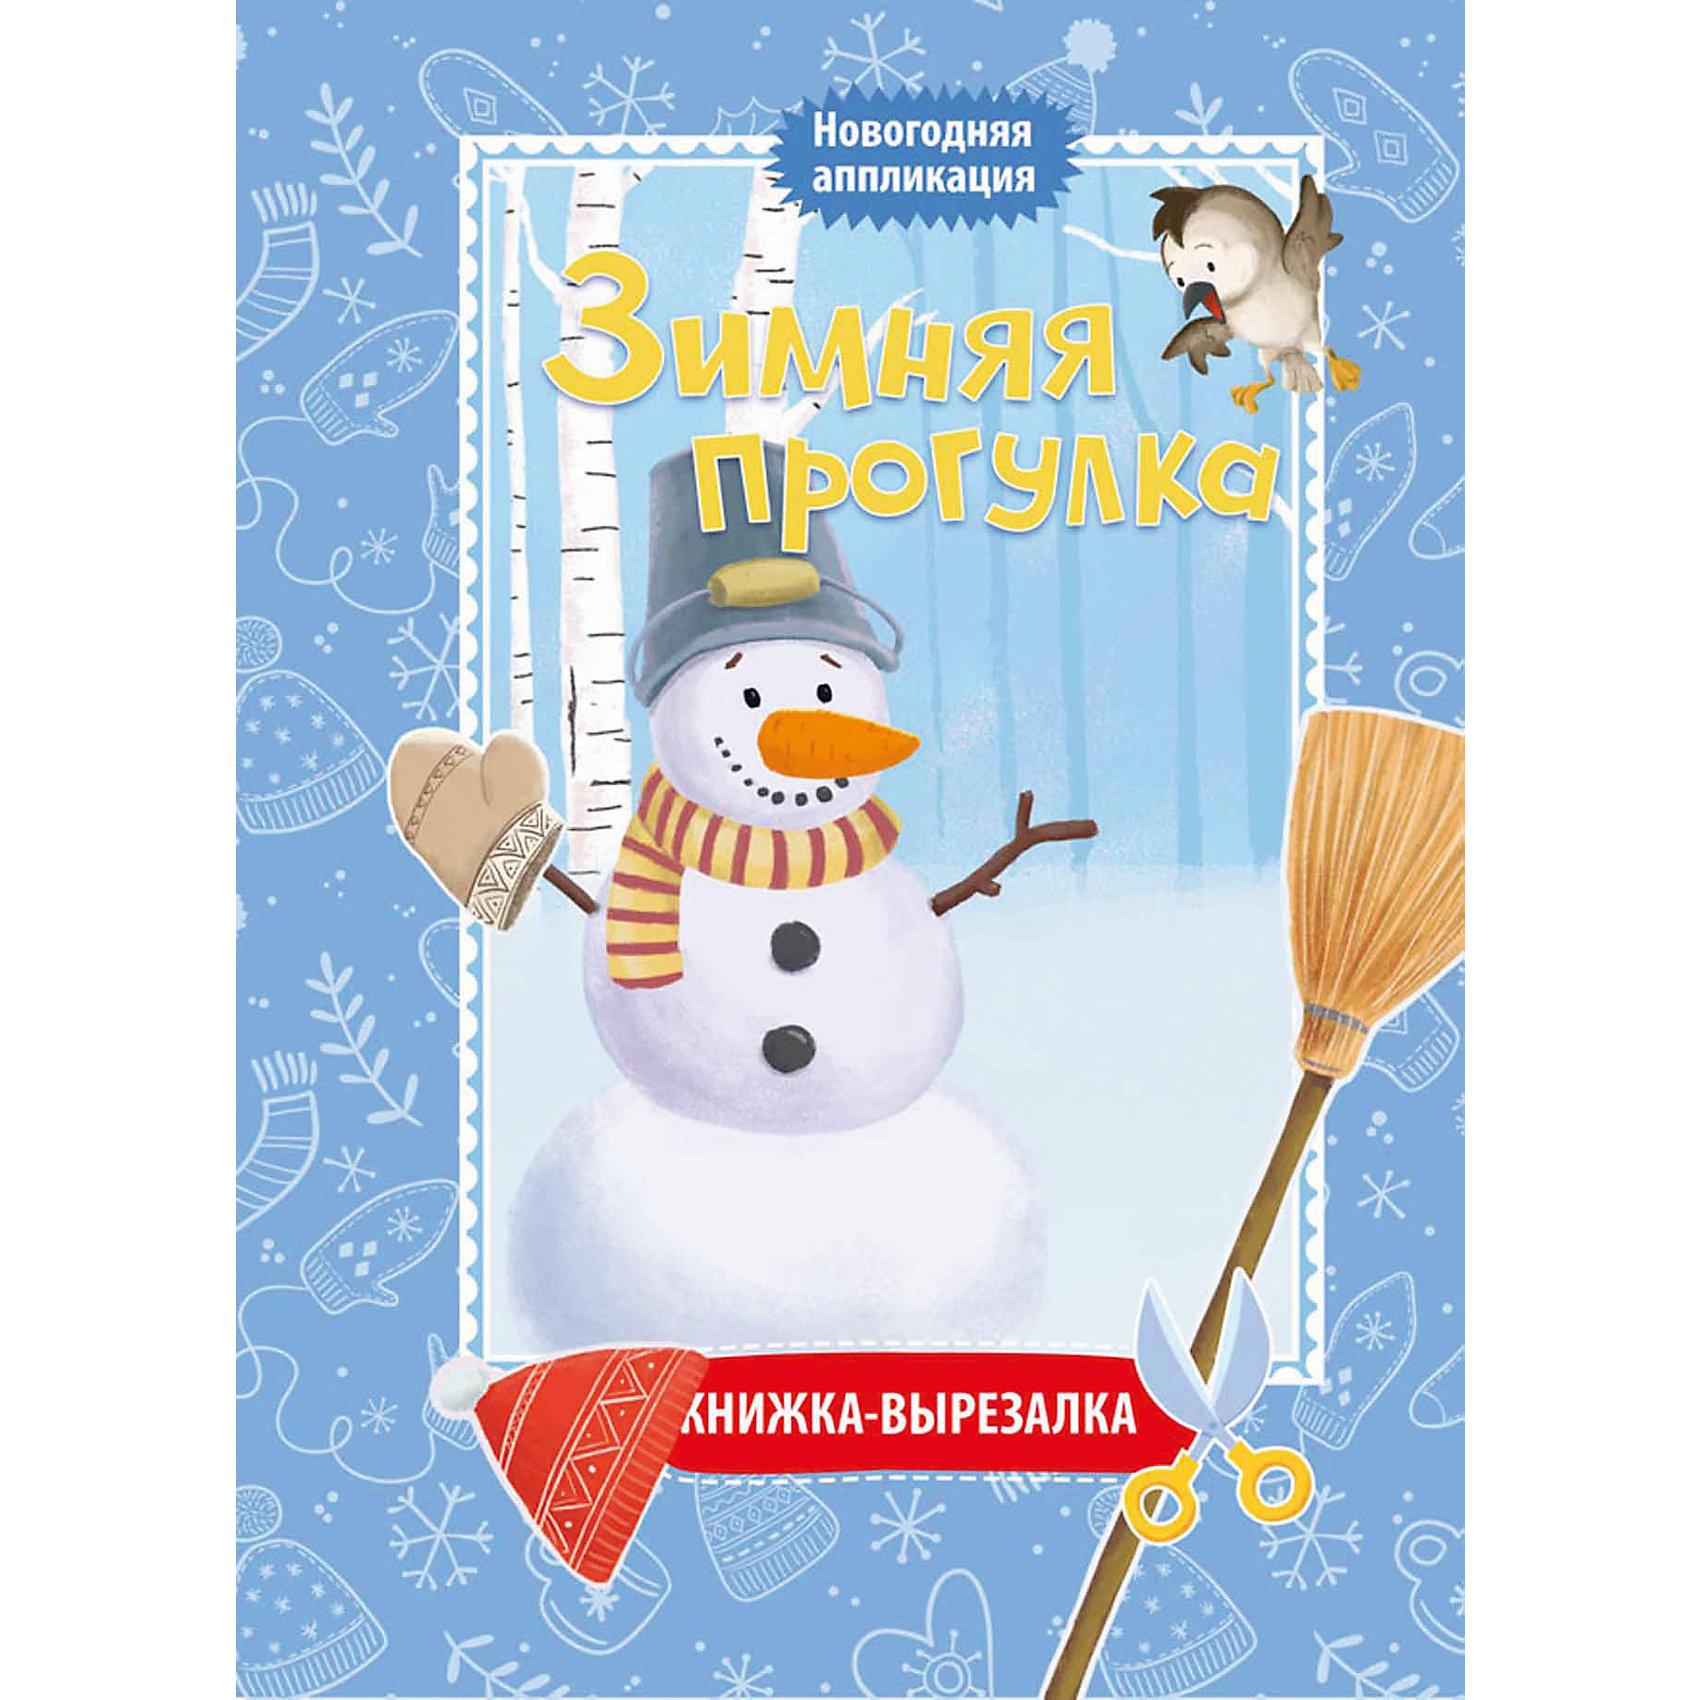 Fenix Зимняя прогулка:книжка-вырезалка дп fenix правила безопасности дома для малышей